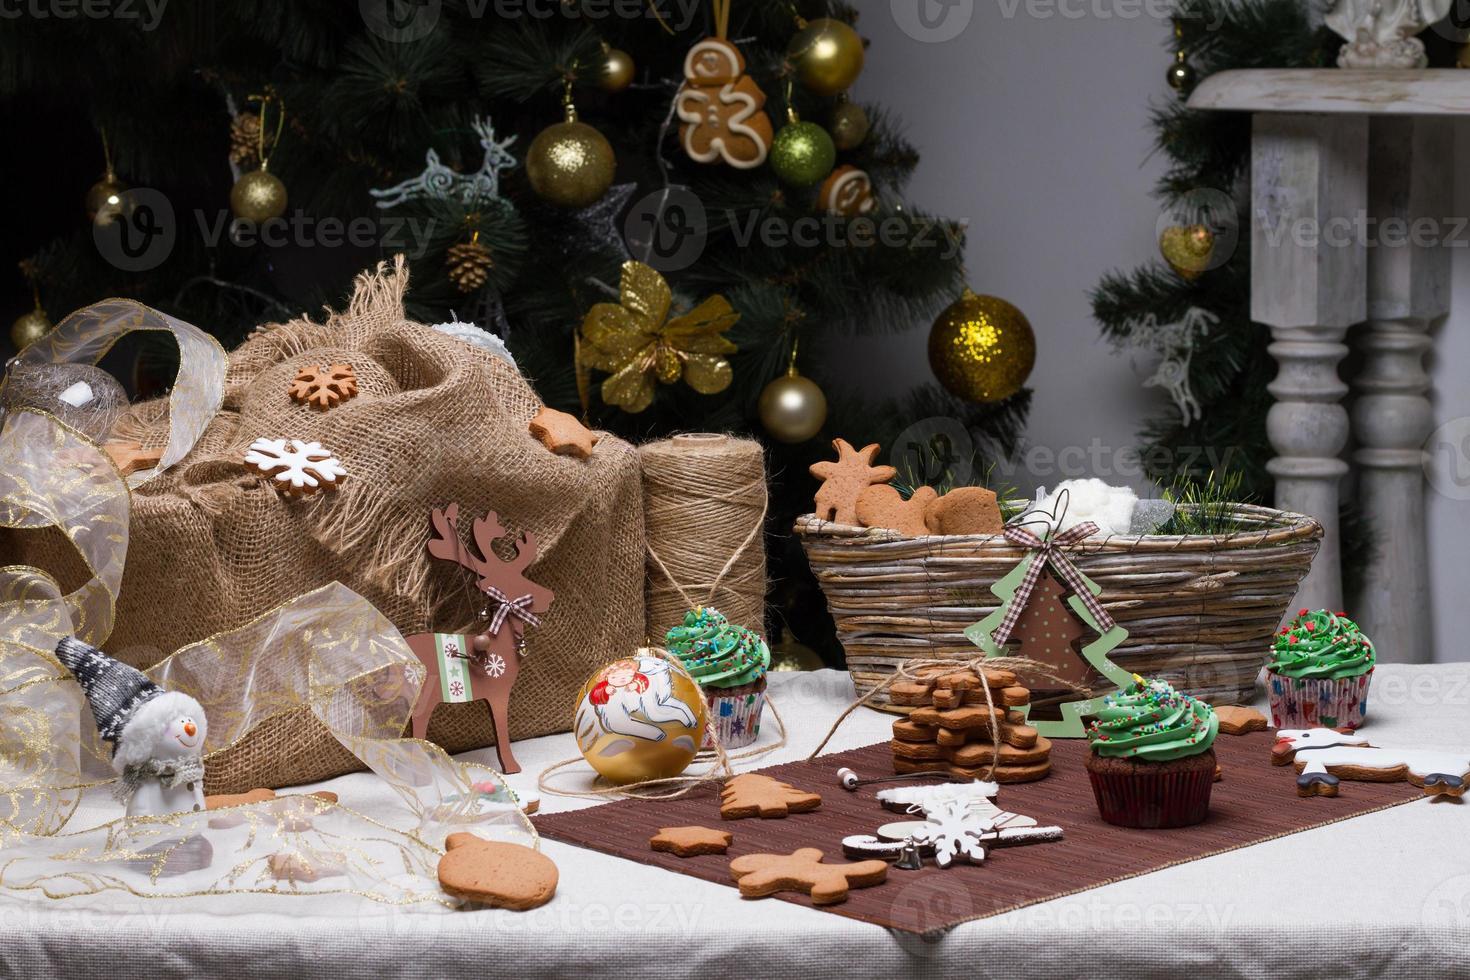 Natale vari biscotti di pan di zenzero, torte, cupcakes foto